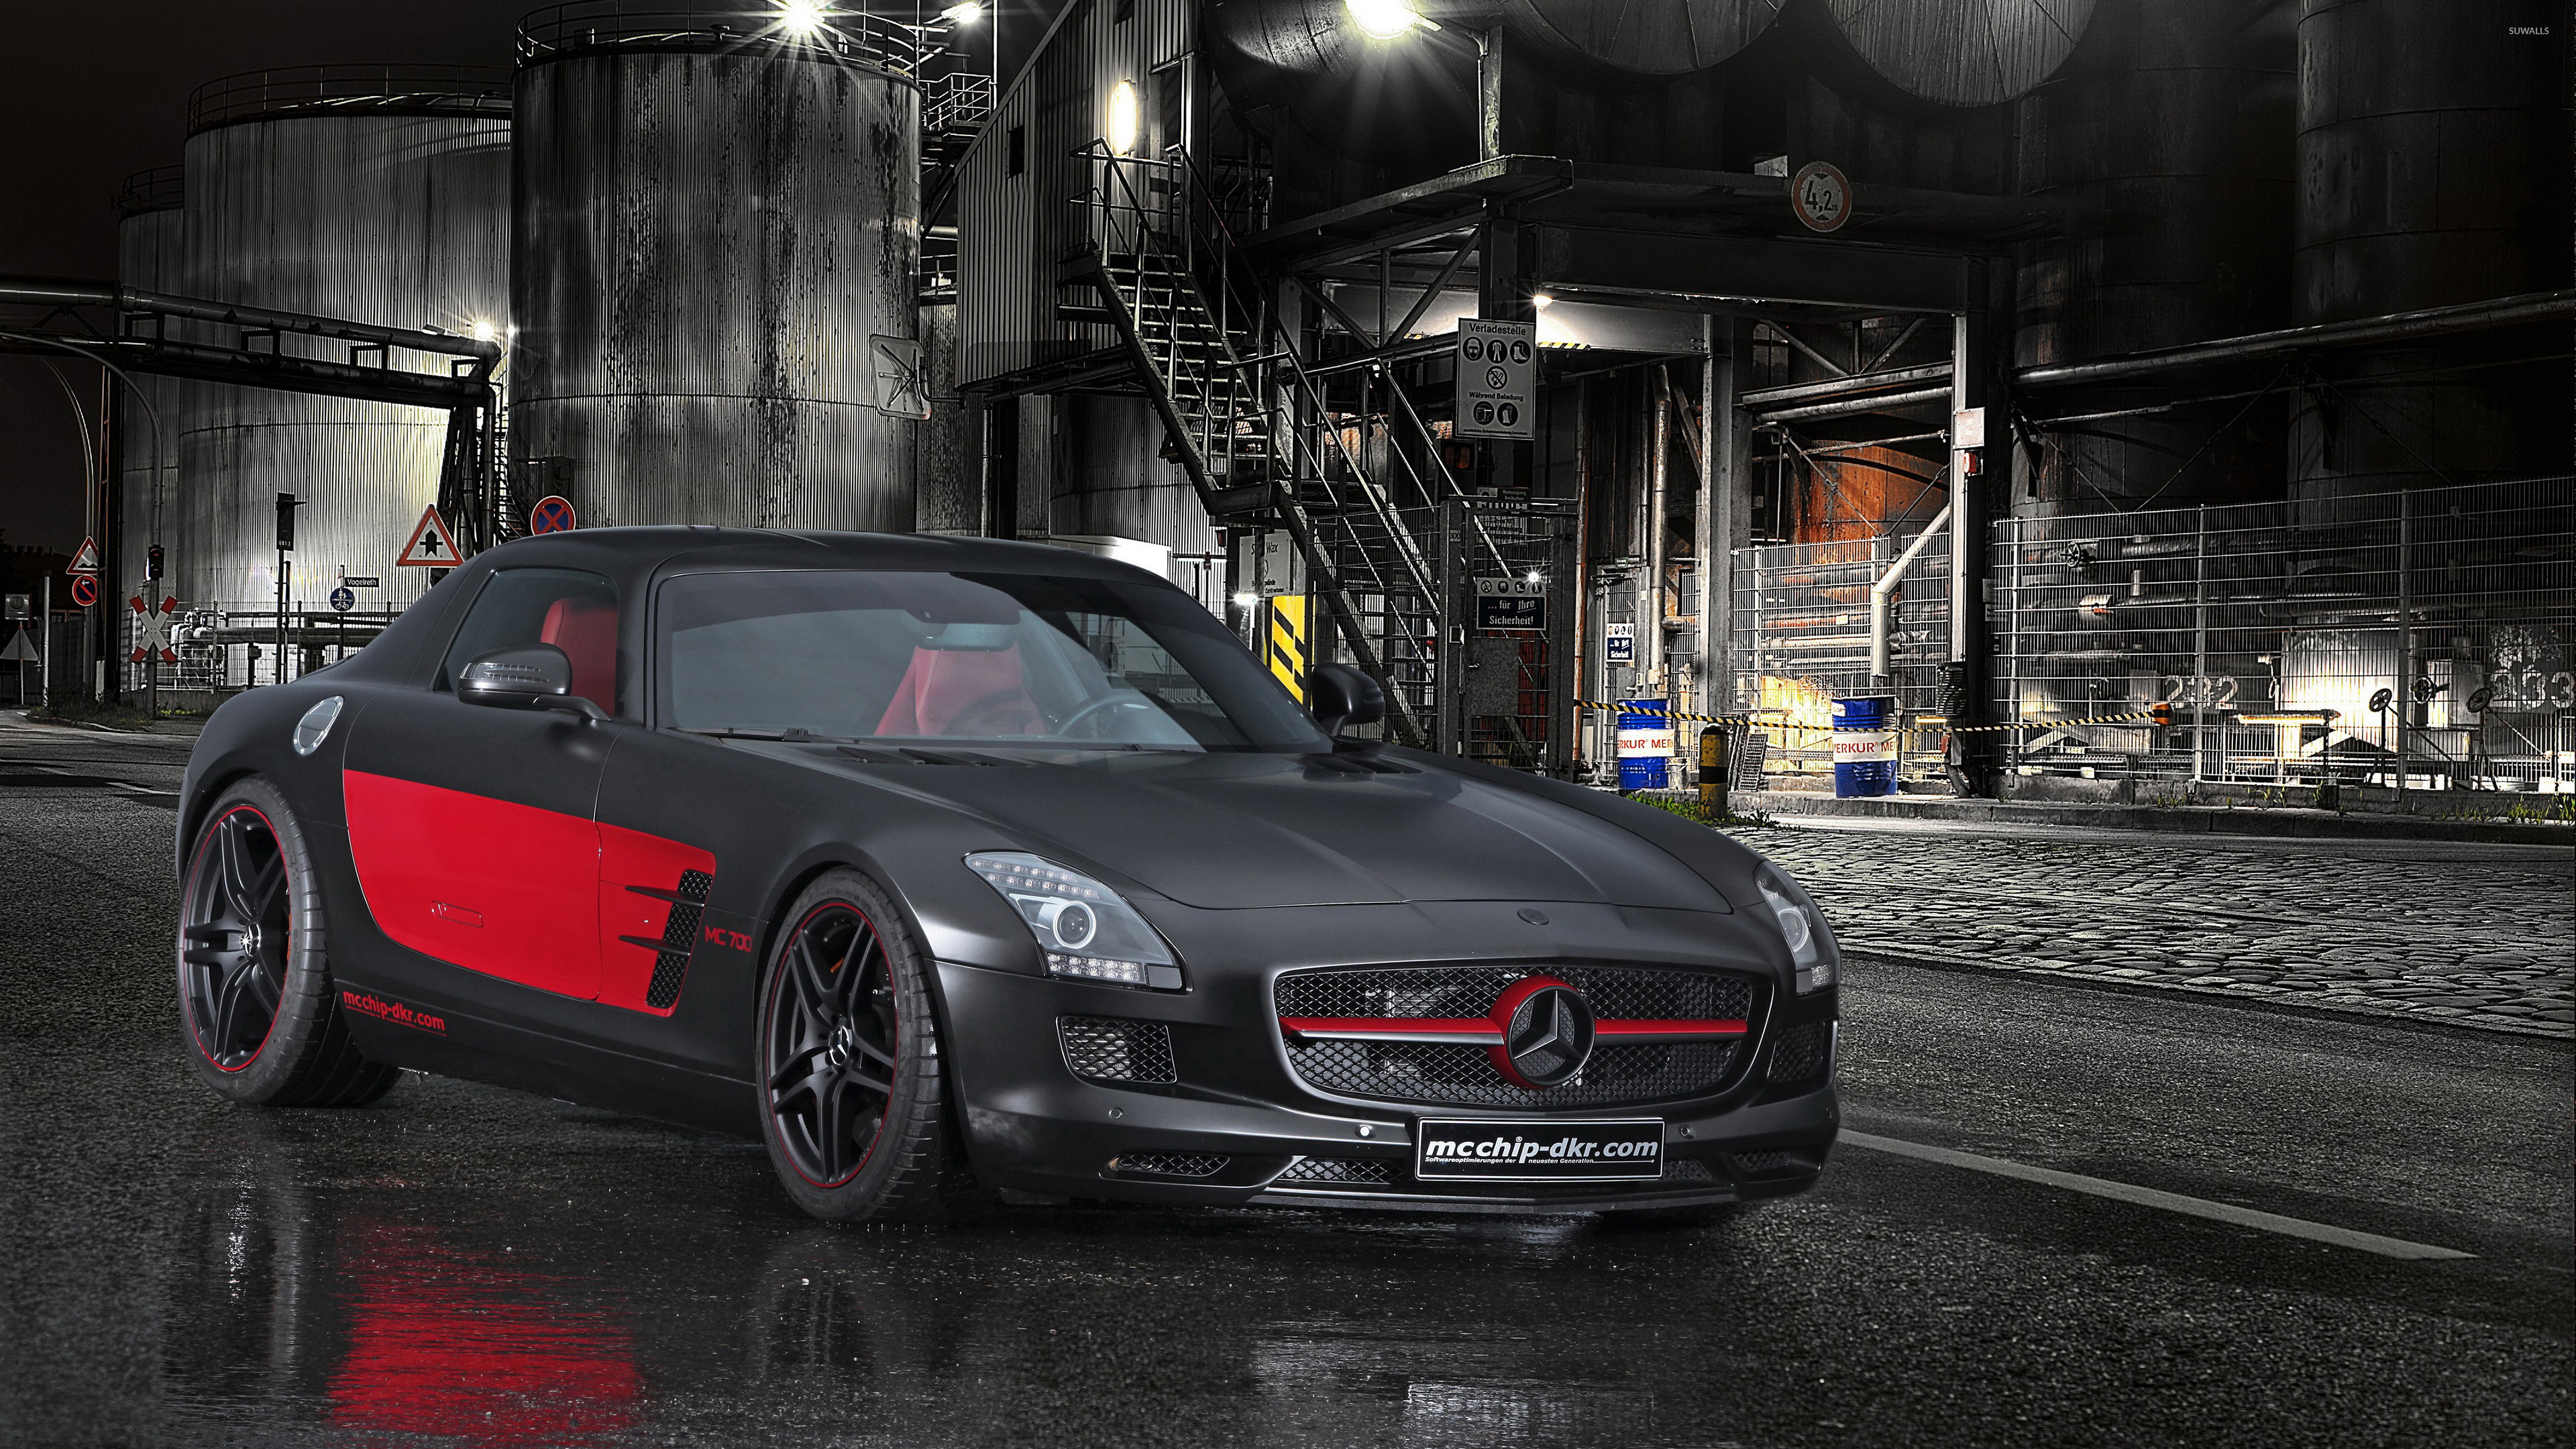 Black and red mcchip dkr mercedes benz sls amg wallpaper for Mercedes benz sls amg red